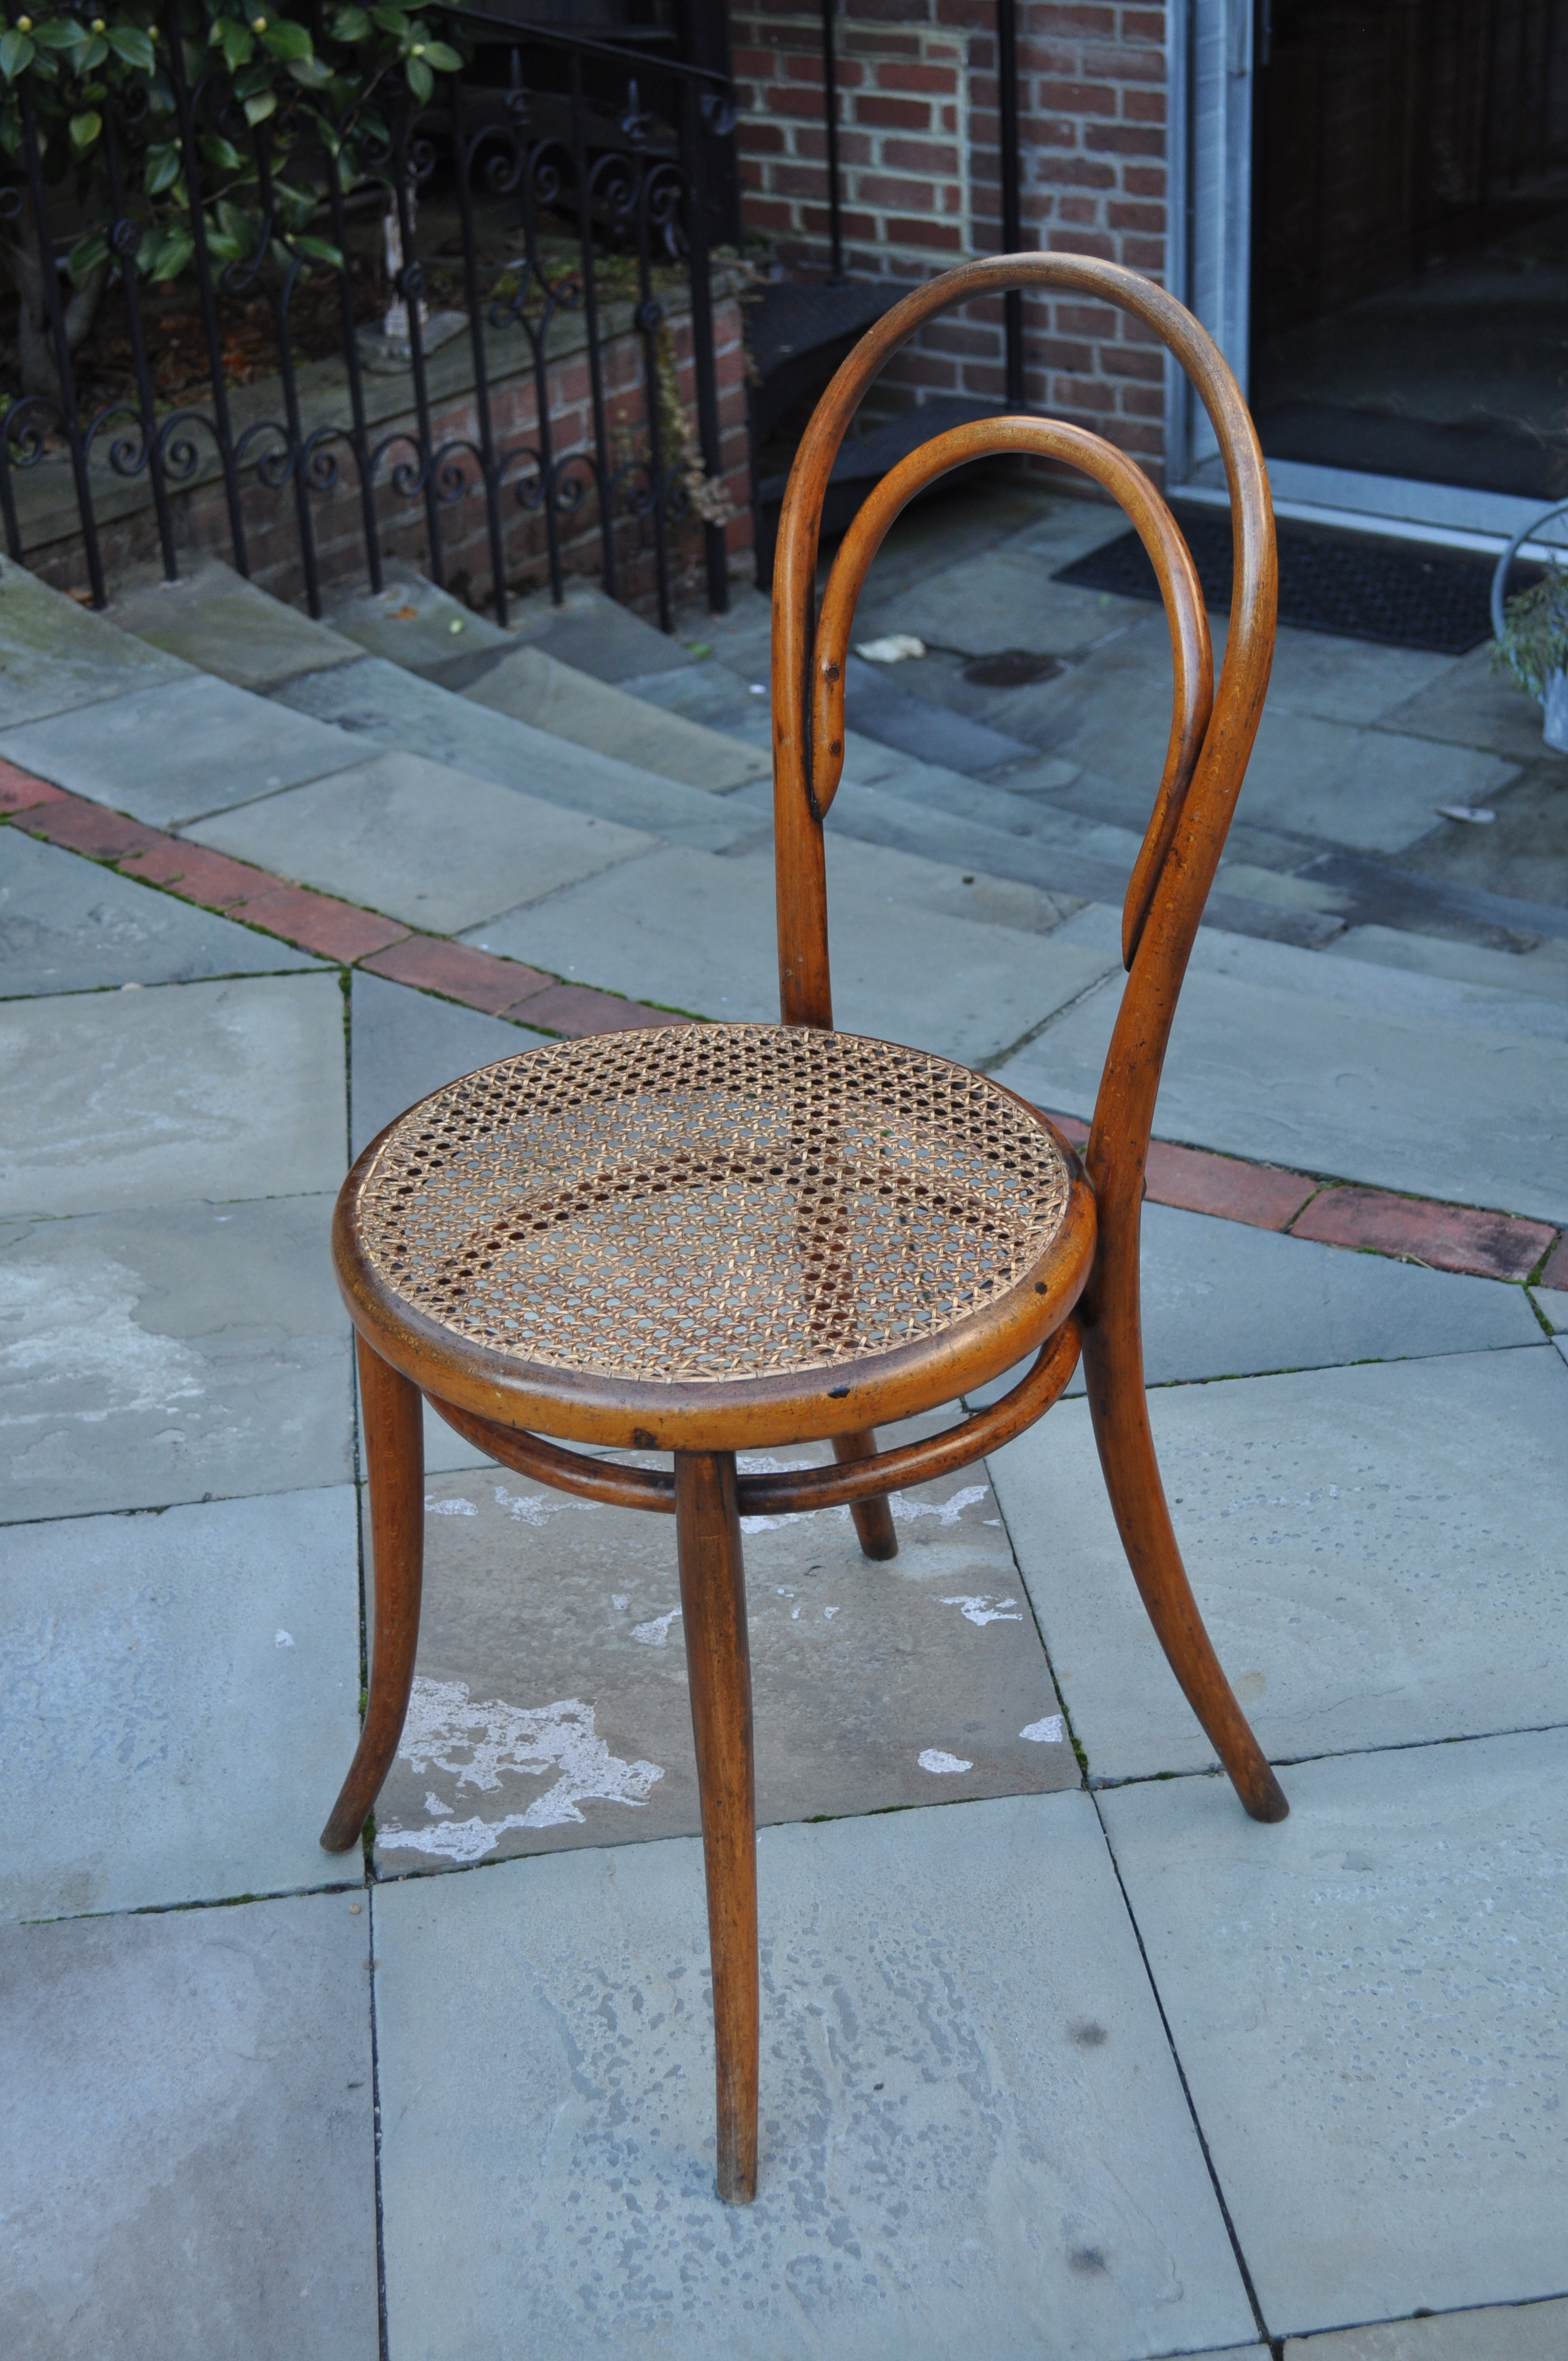 FileThonet Chair No 14JPG Wikimedia Commons